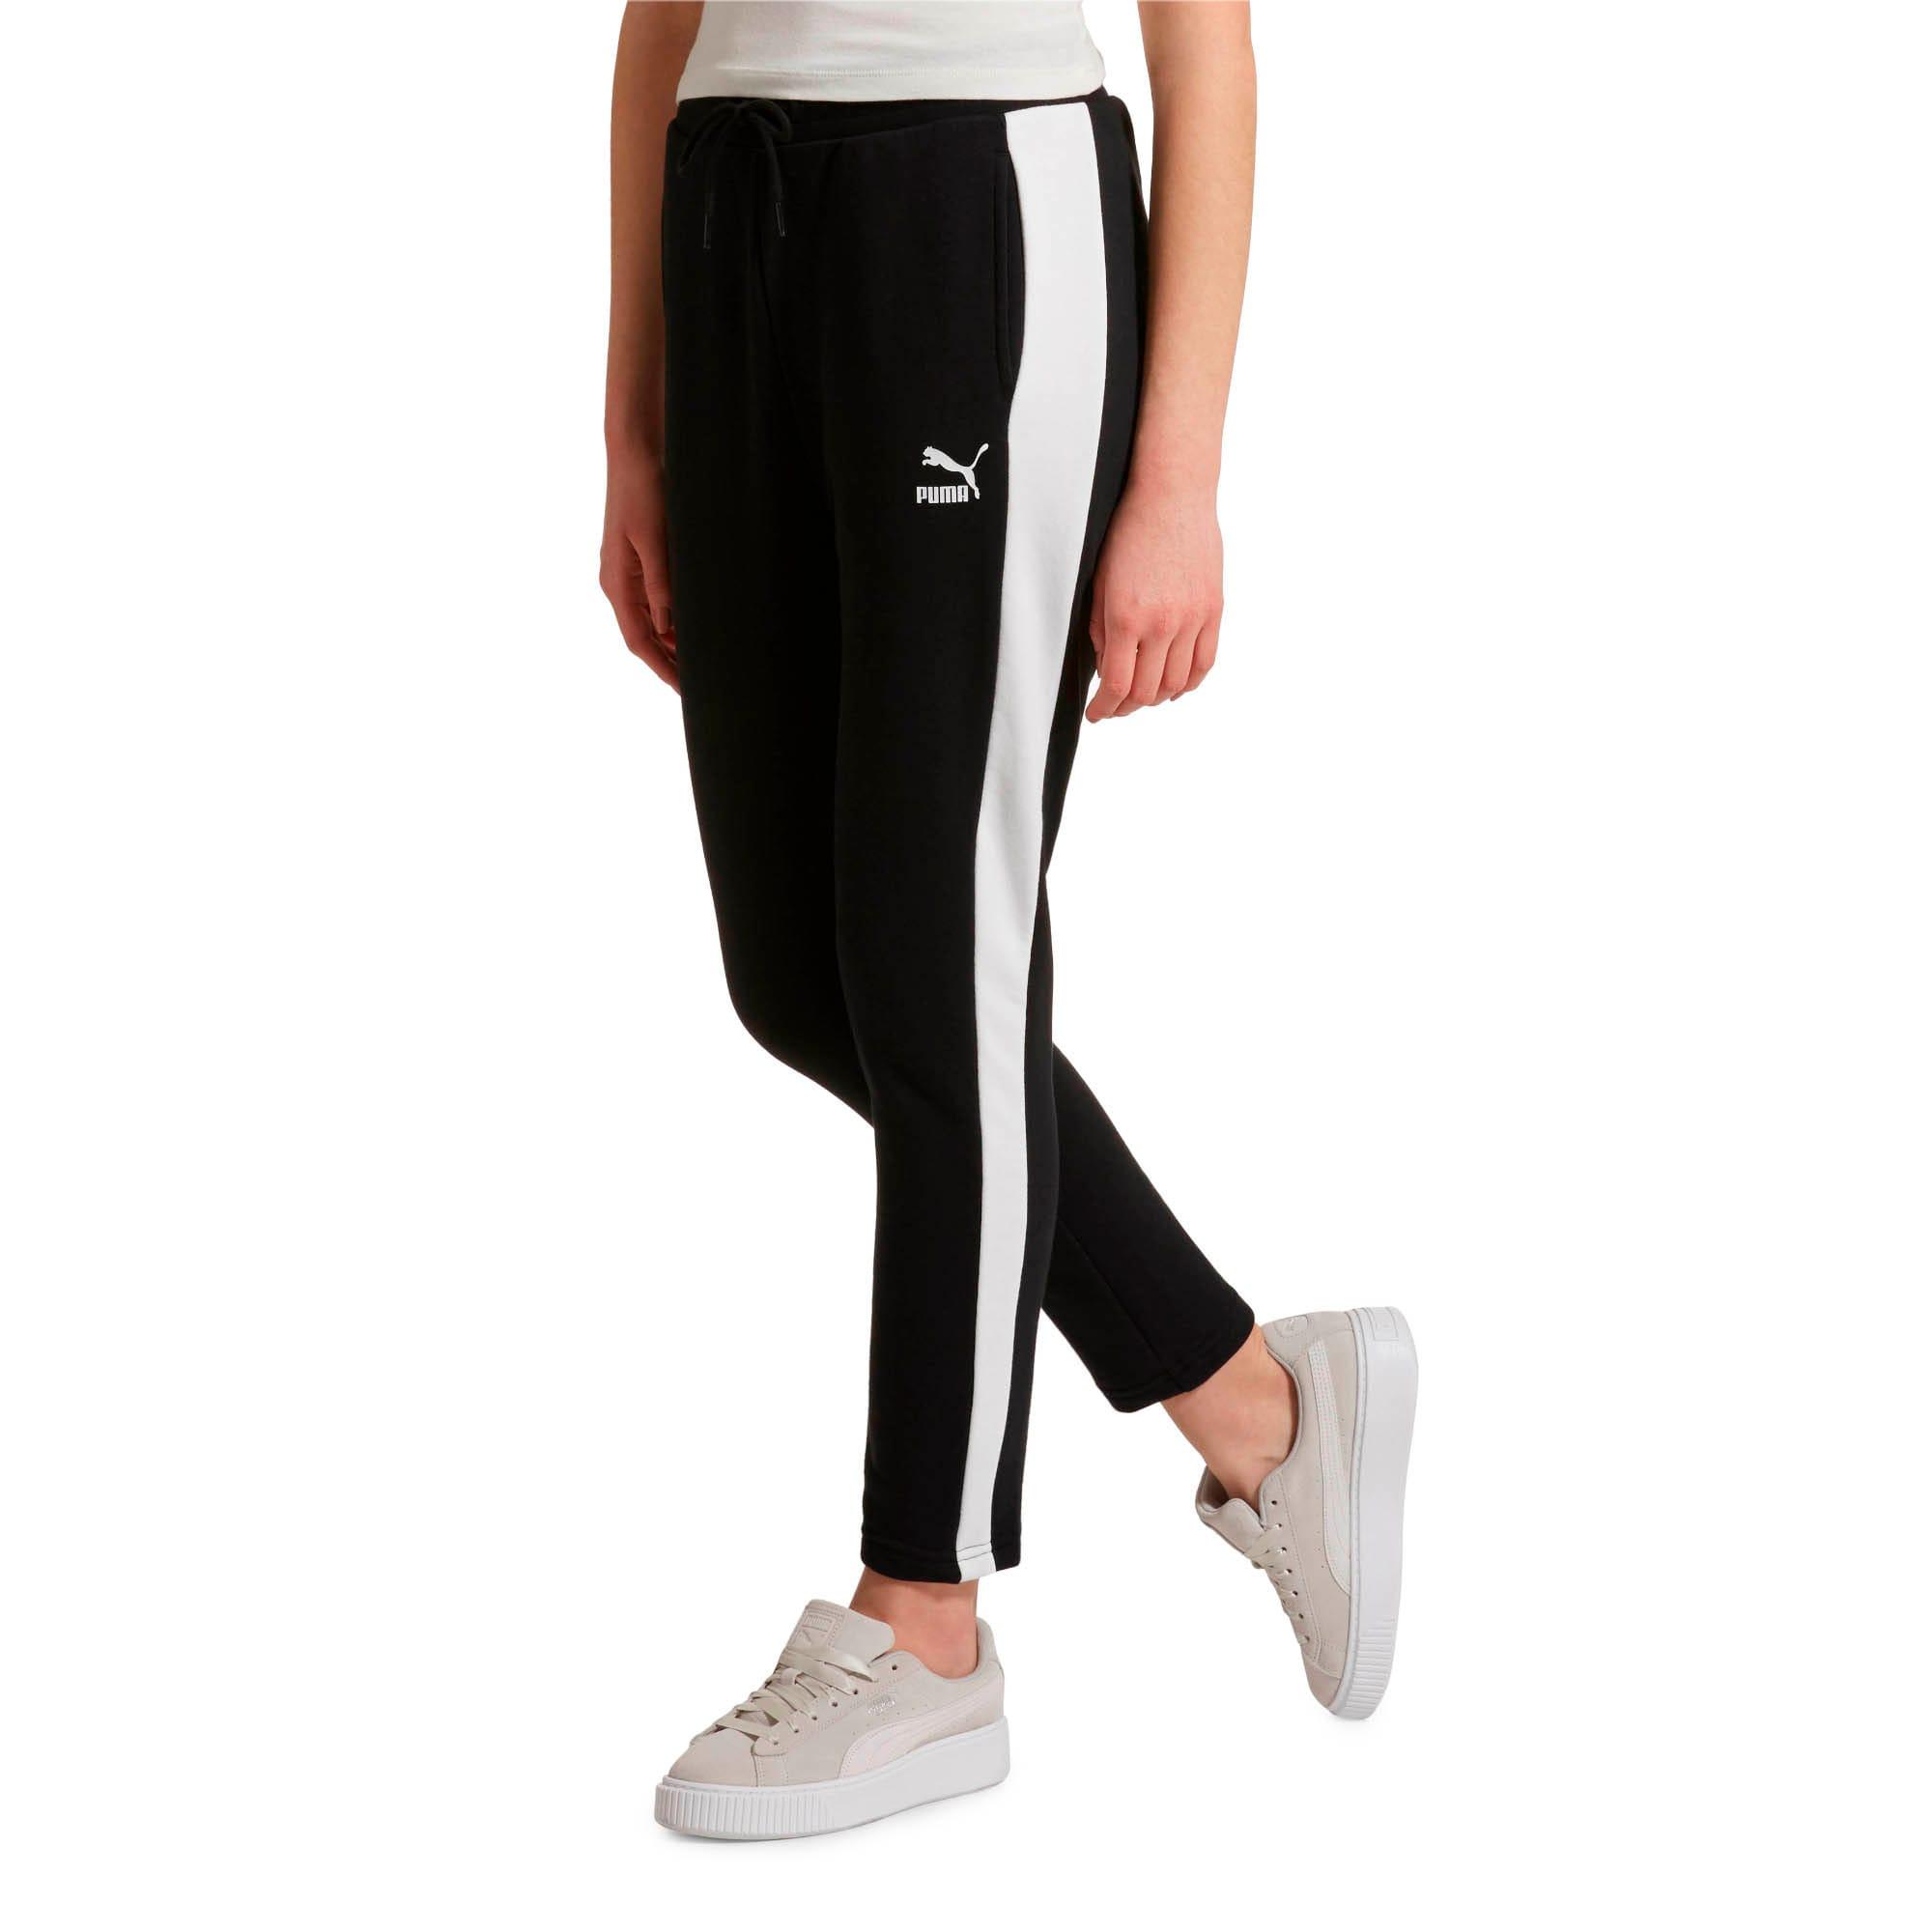 Miniatura 2 de Pantalones deportivos Classics T7 de felpa francesa para mujer, Cotton Black, mediano